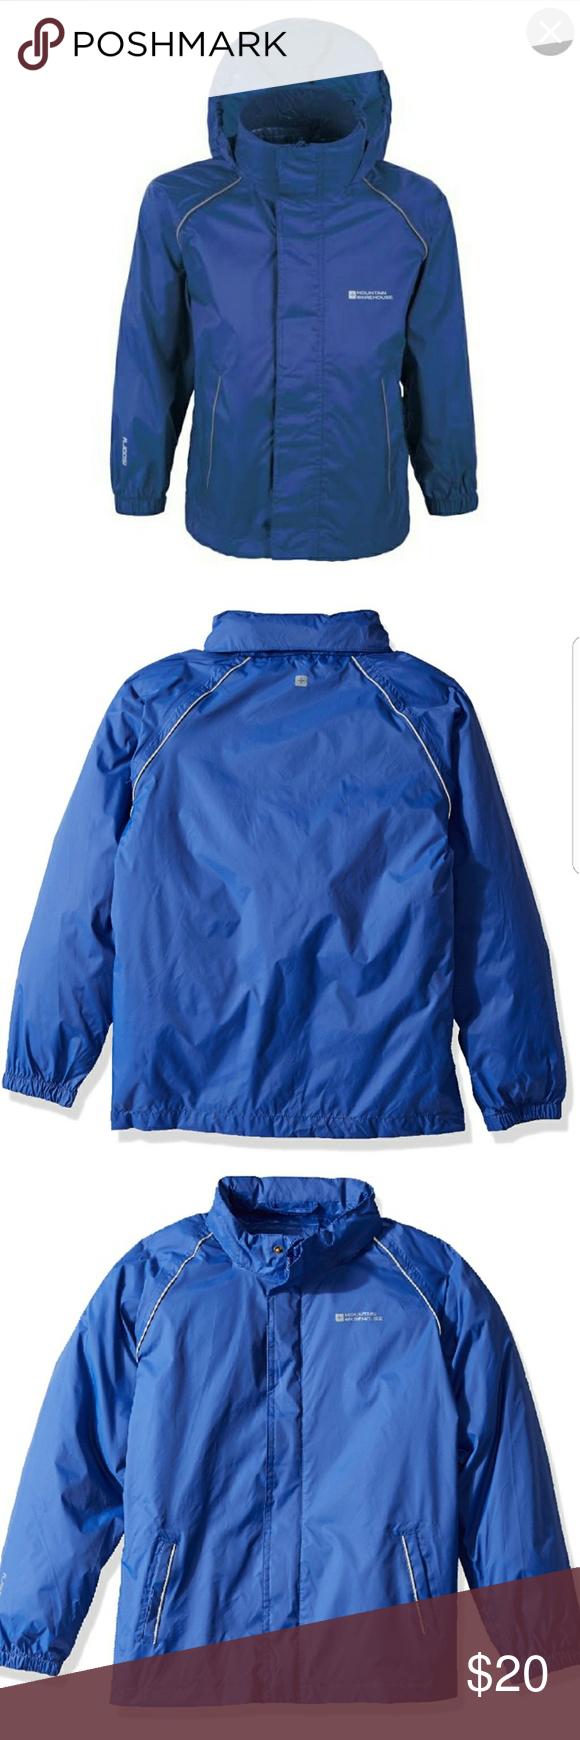 36536162e Kids jacket Pakka Kids waterproof jacket - Navy size 2-3 Mountain Warehouse  Jackets & Coats Raincoats